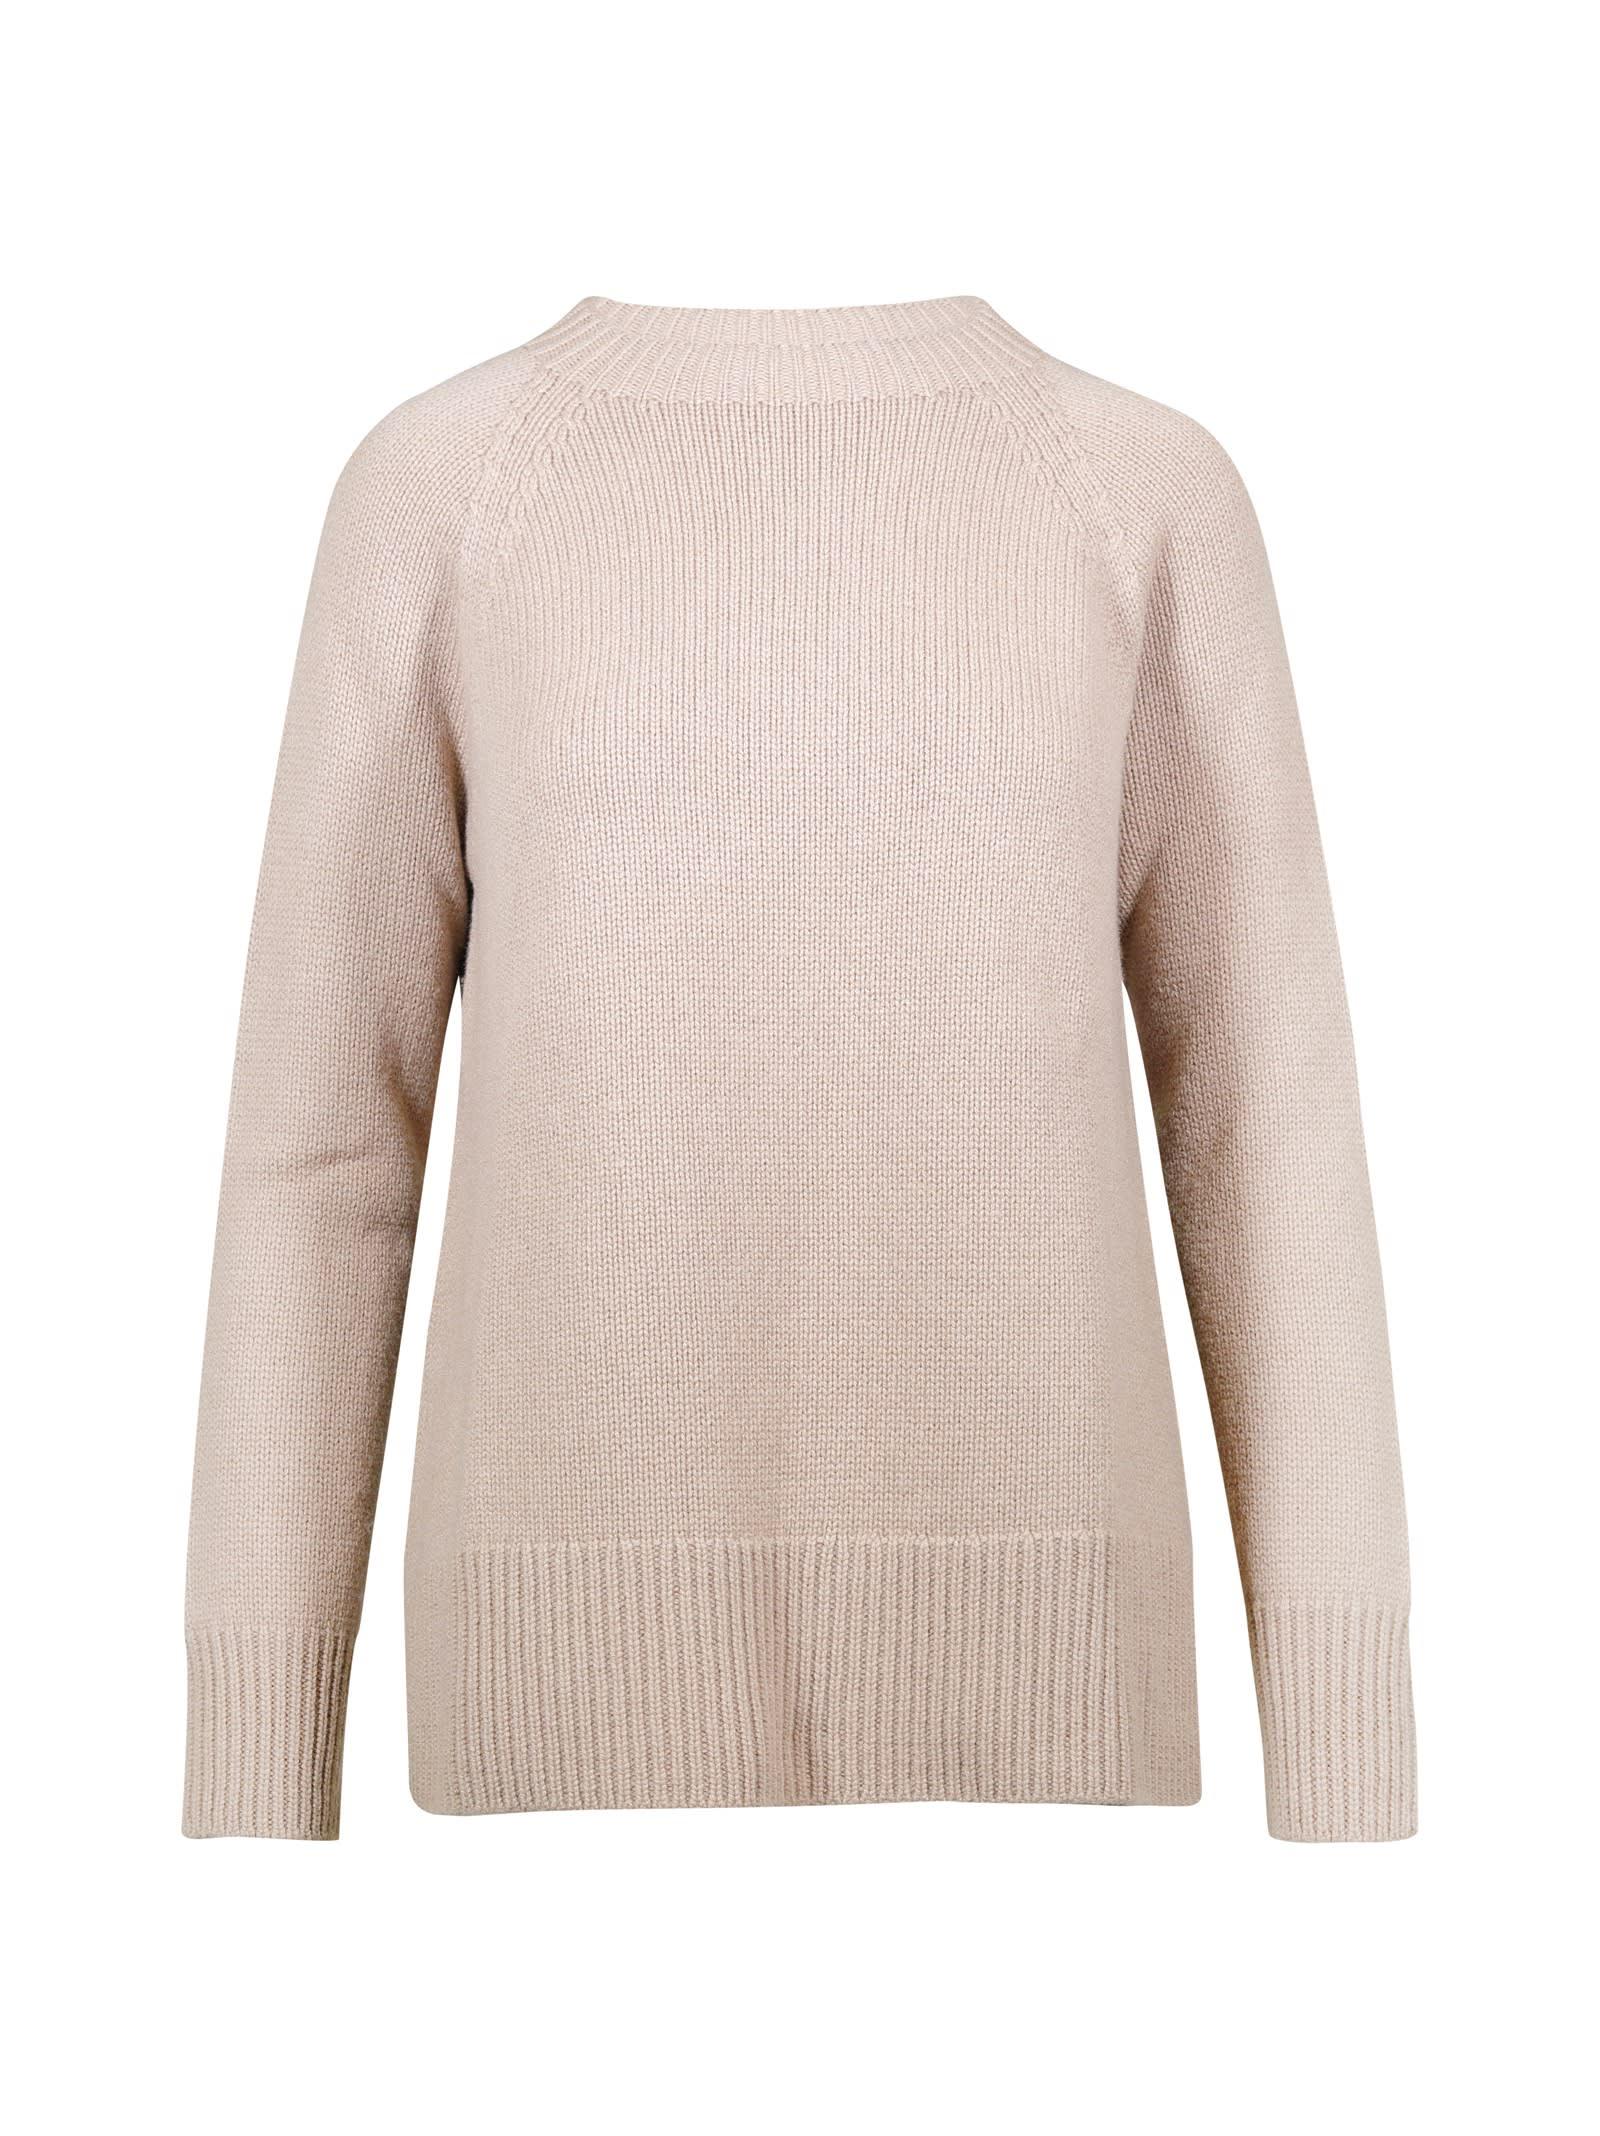 S Max Mara Como Sweater